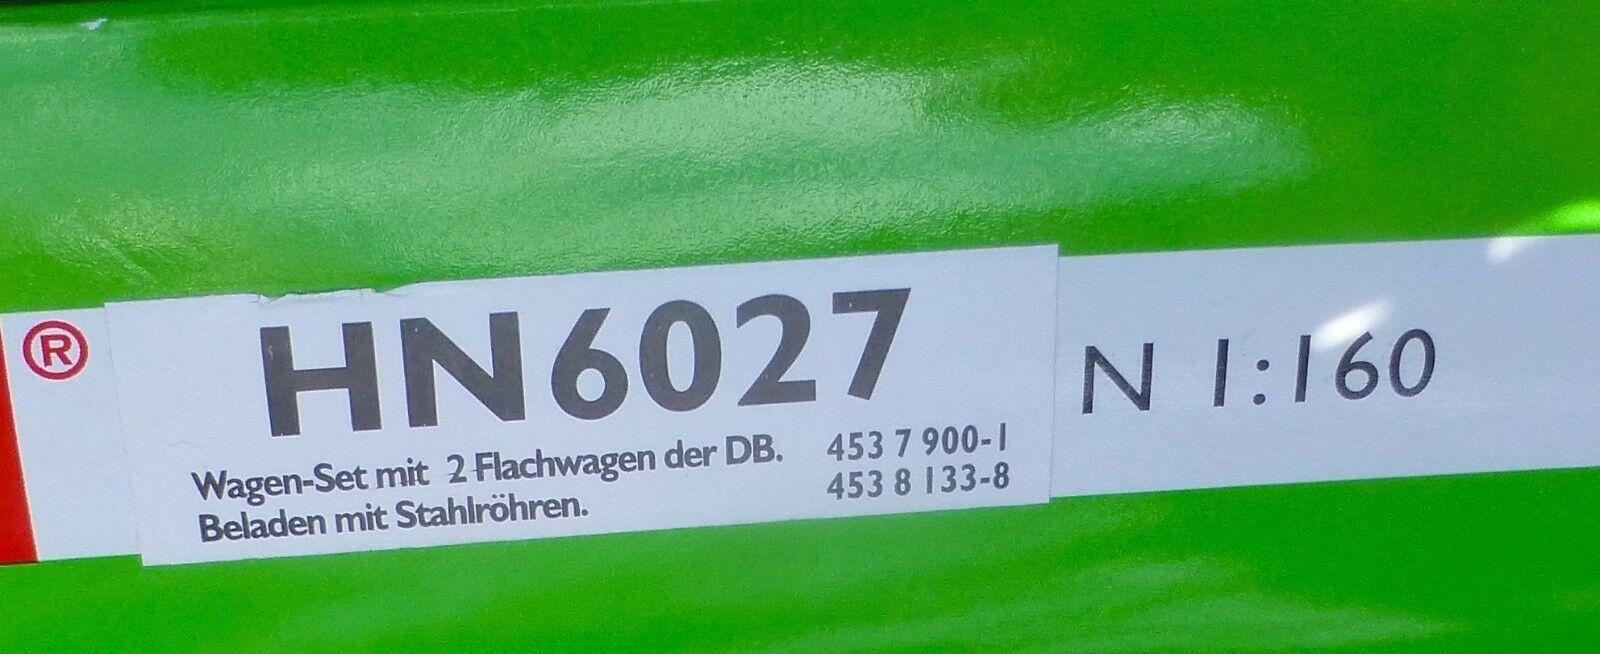 2 2 2 Wagon Plat Chargé M Mannesmann Wagons Tubesd'Acier Db Arnold HN6027 N 1 160 e44189